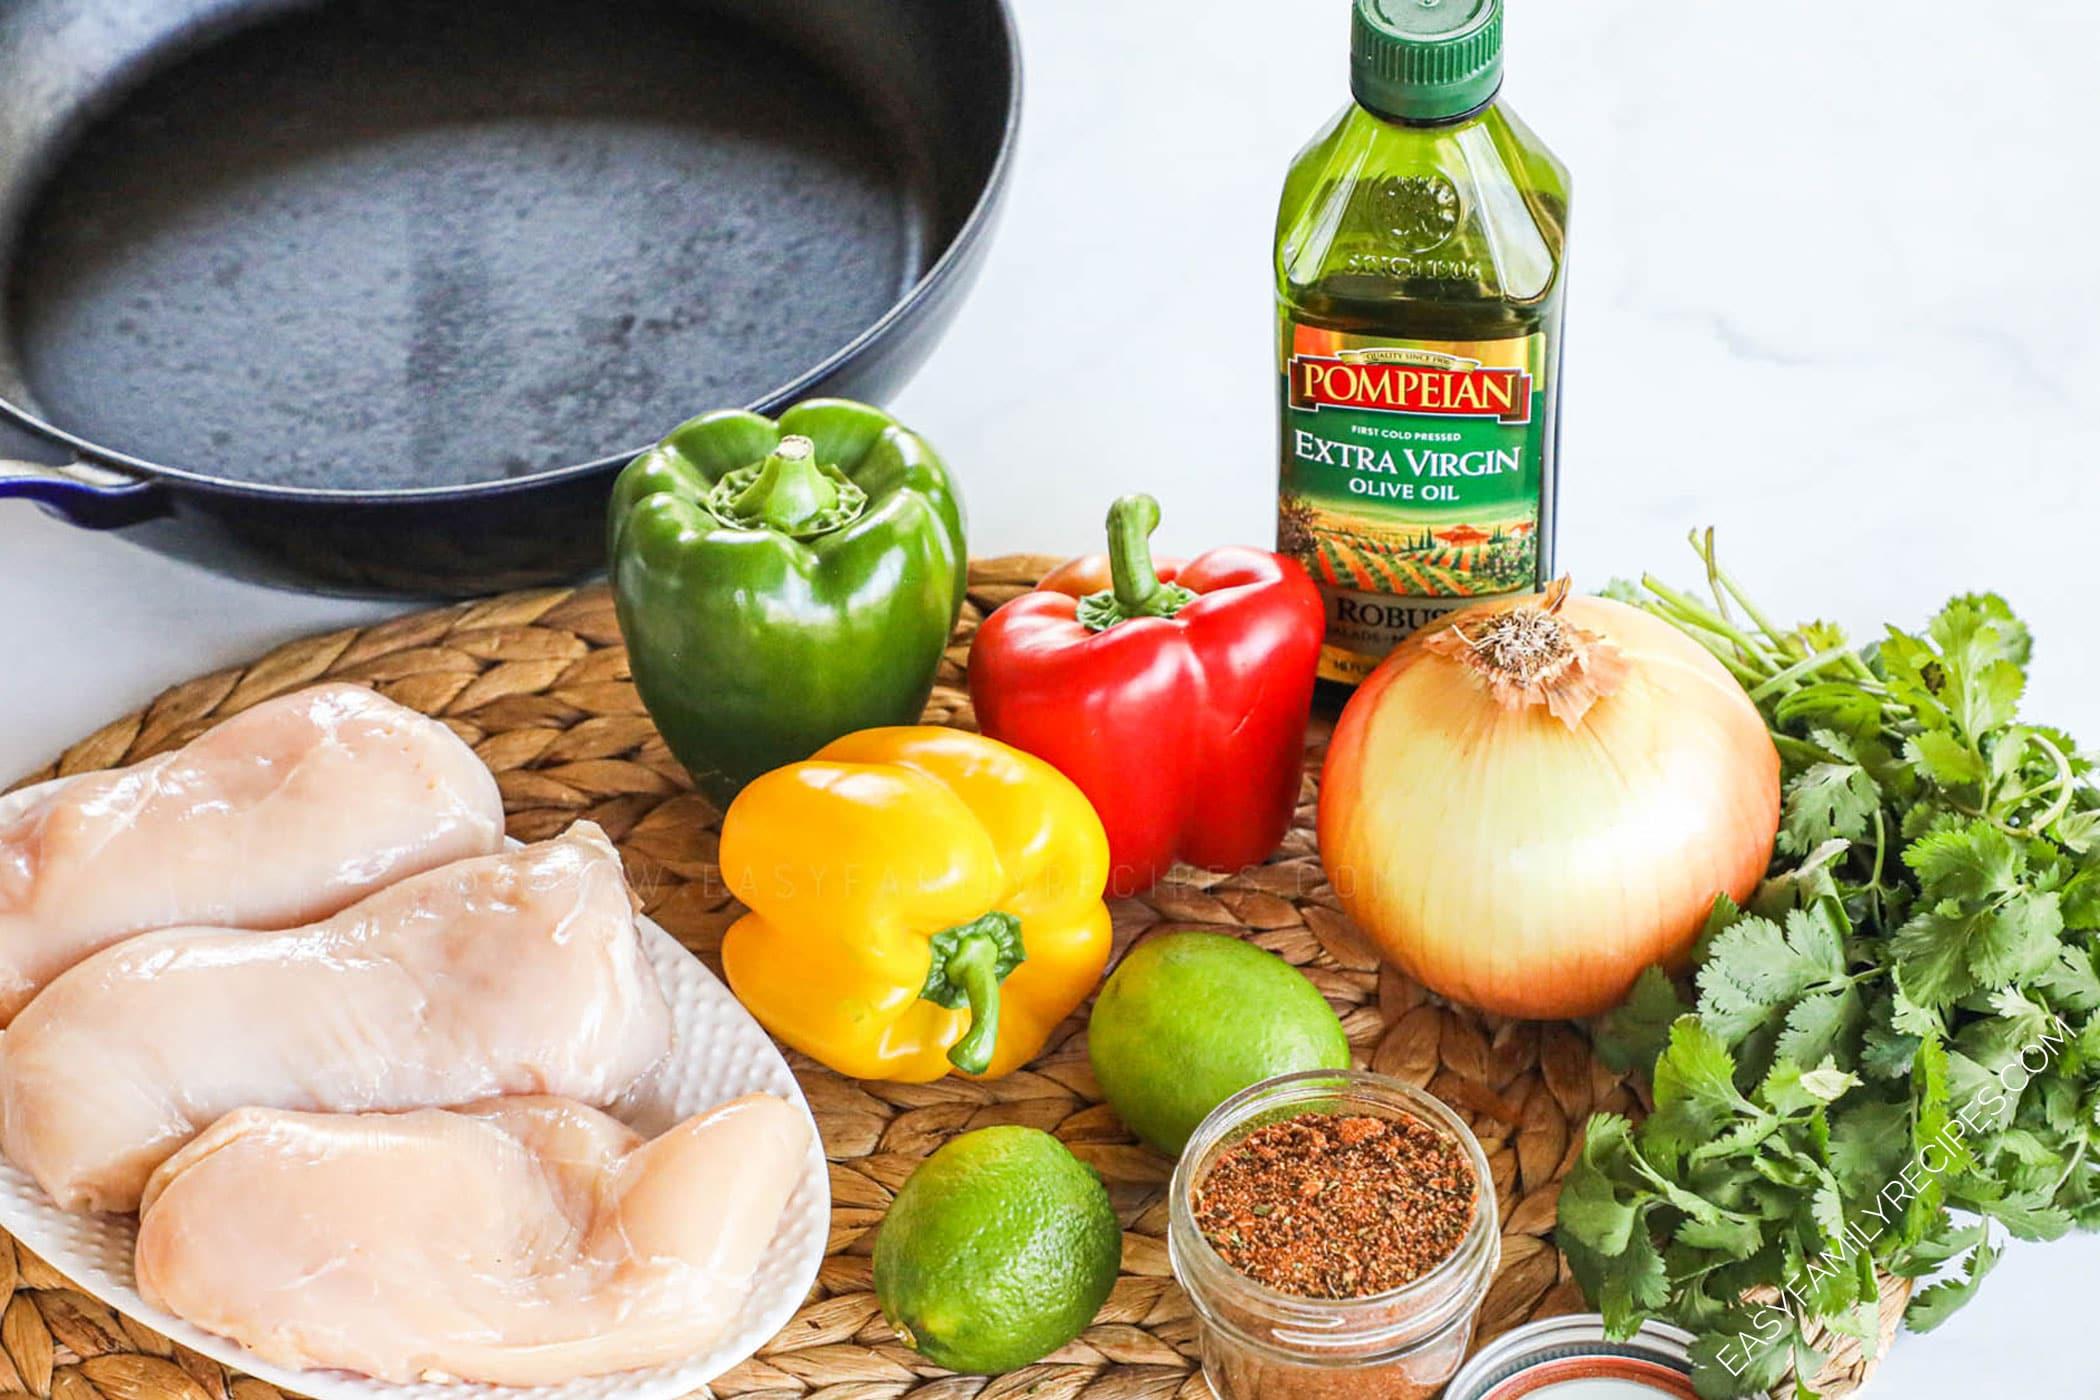 Ingredients for making chicken fajitas